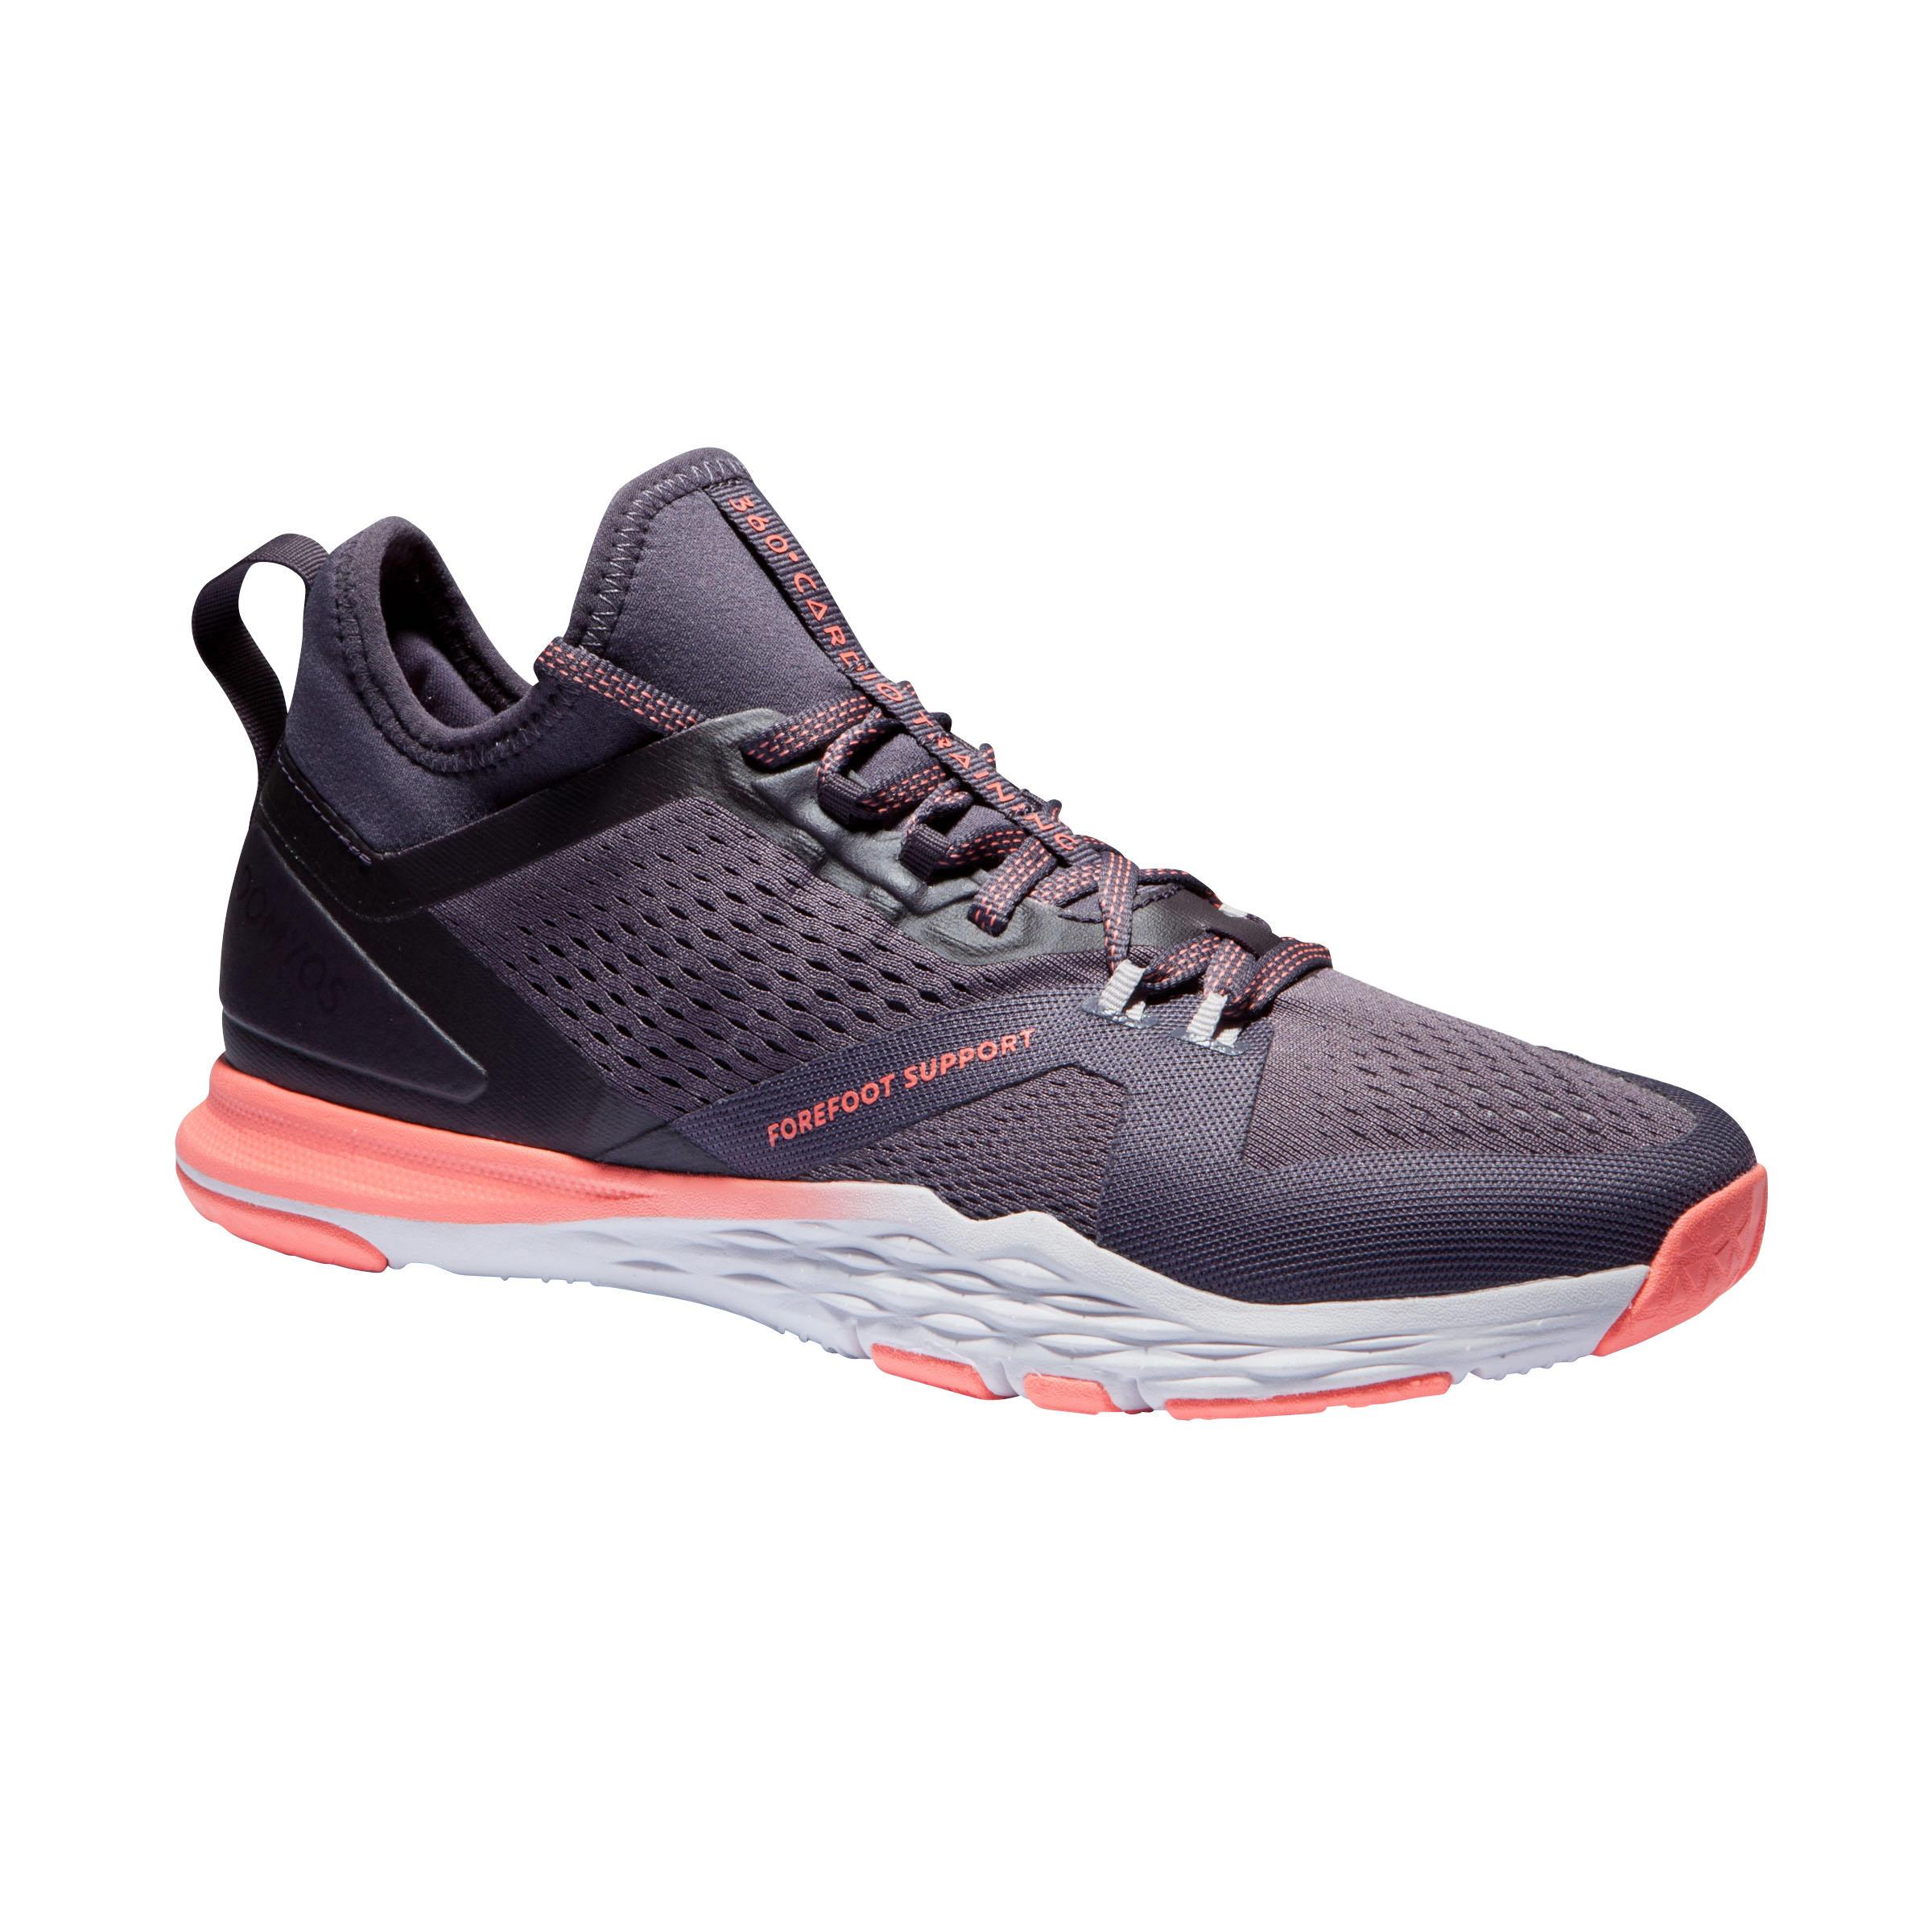 Fitnessschuhe Fitness Cardio 920 violett | Schuhe > Sportschuhe > Fitnessschuhe | Violett - Rot - Rosa | Polyurethan | Domyos